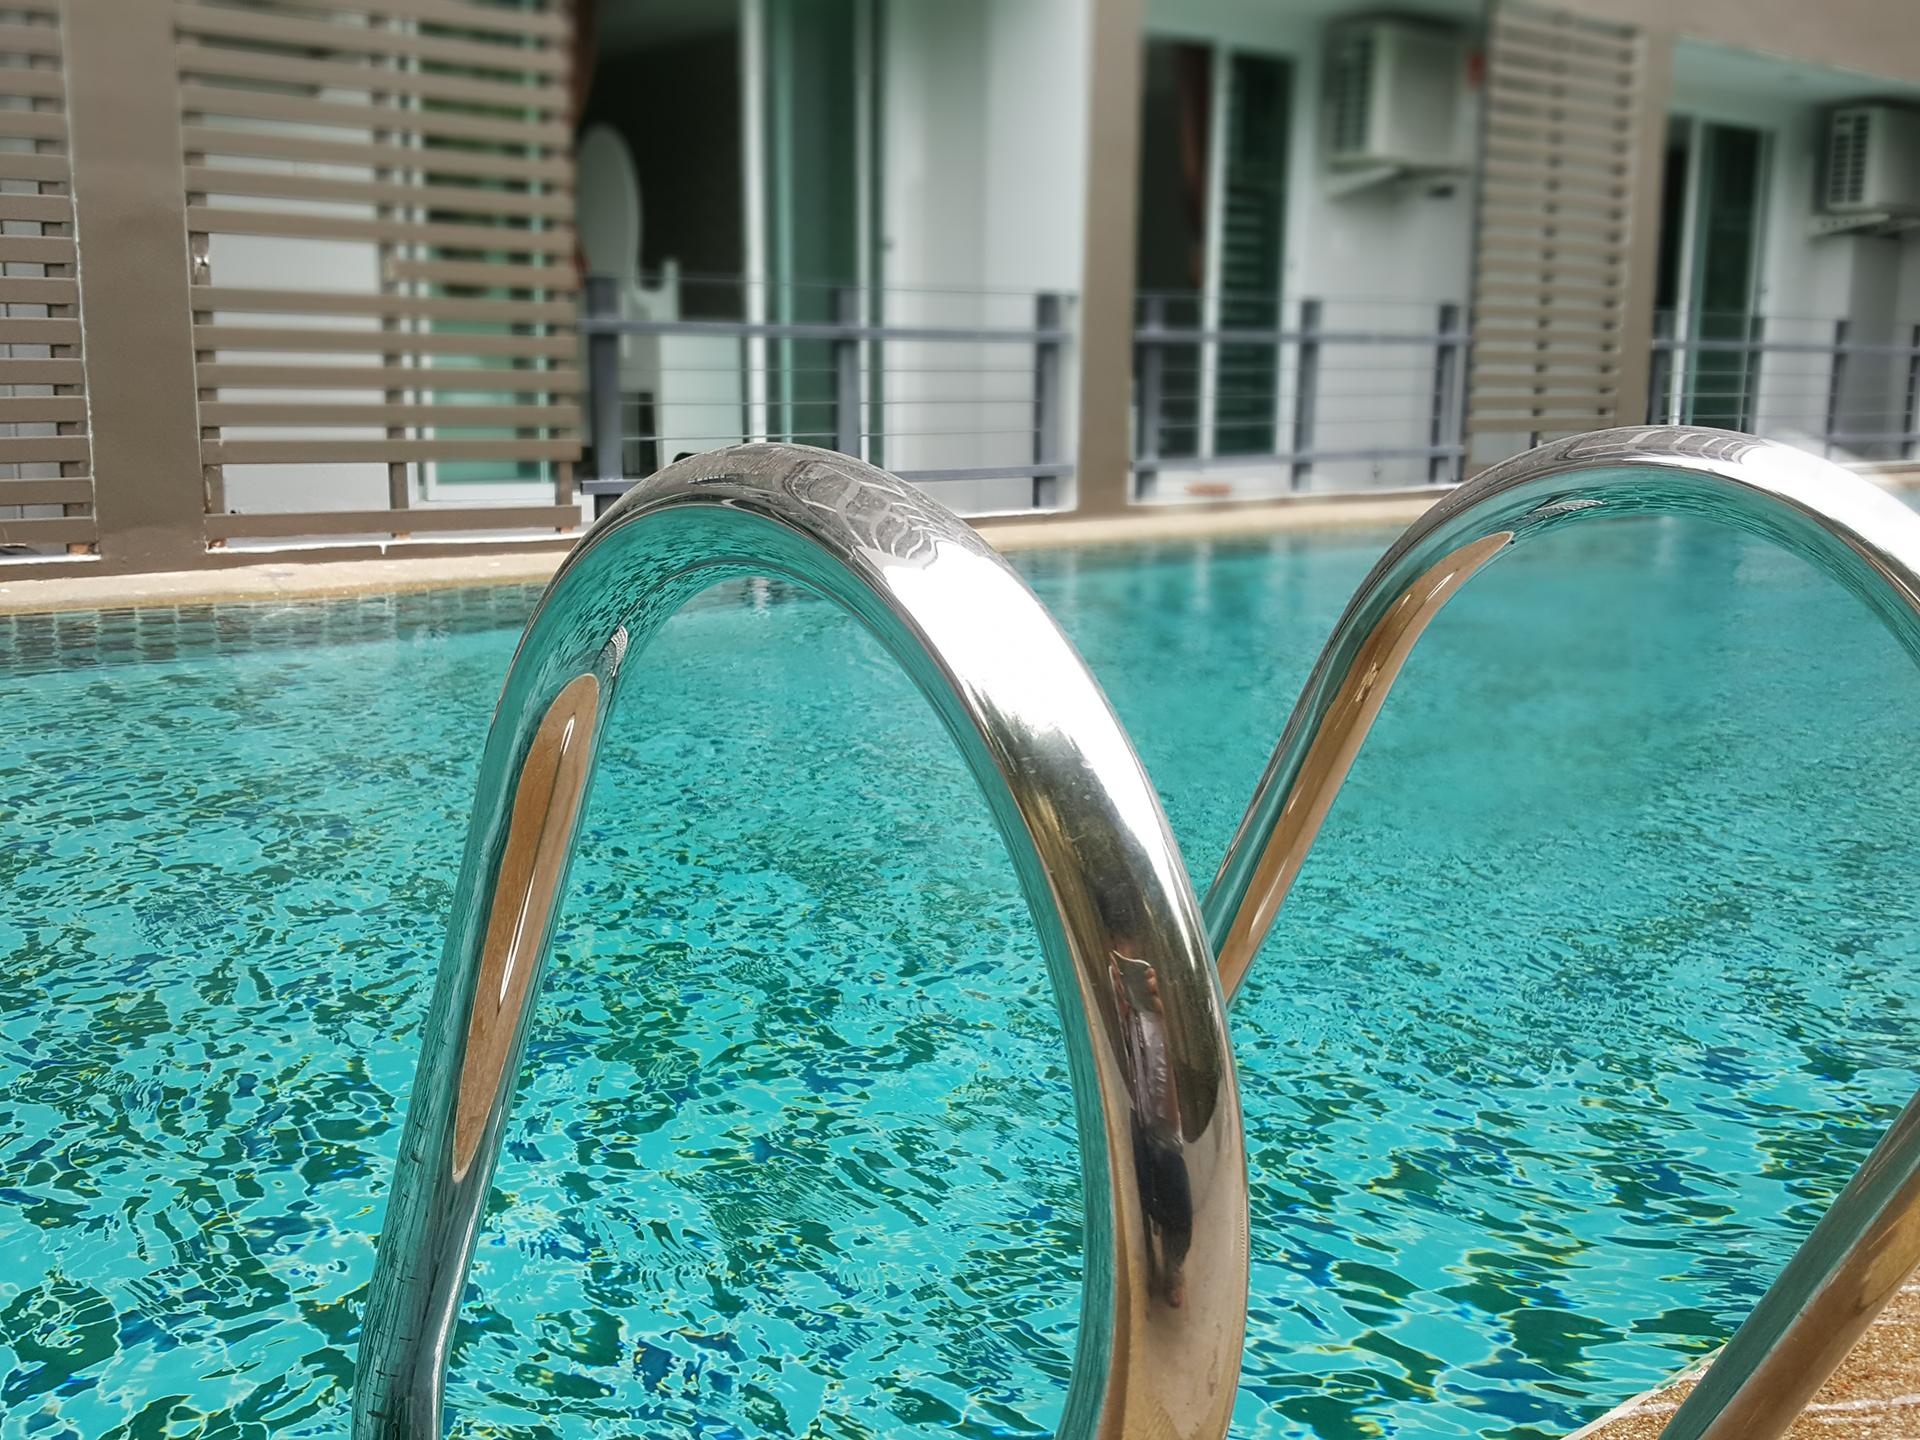 http://retreat-resort.com/images/retreat-resort/our-resort/OurLargeSizeSwimmingPool.jpg